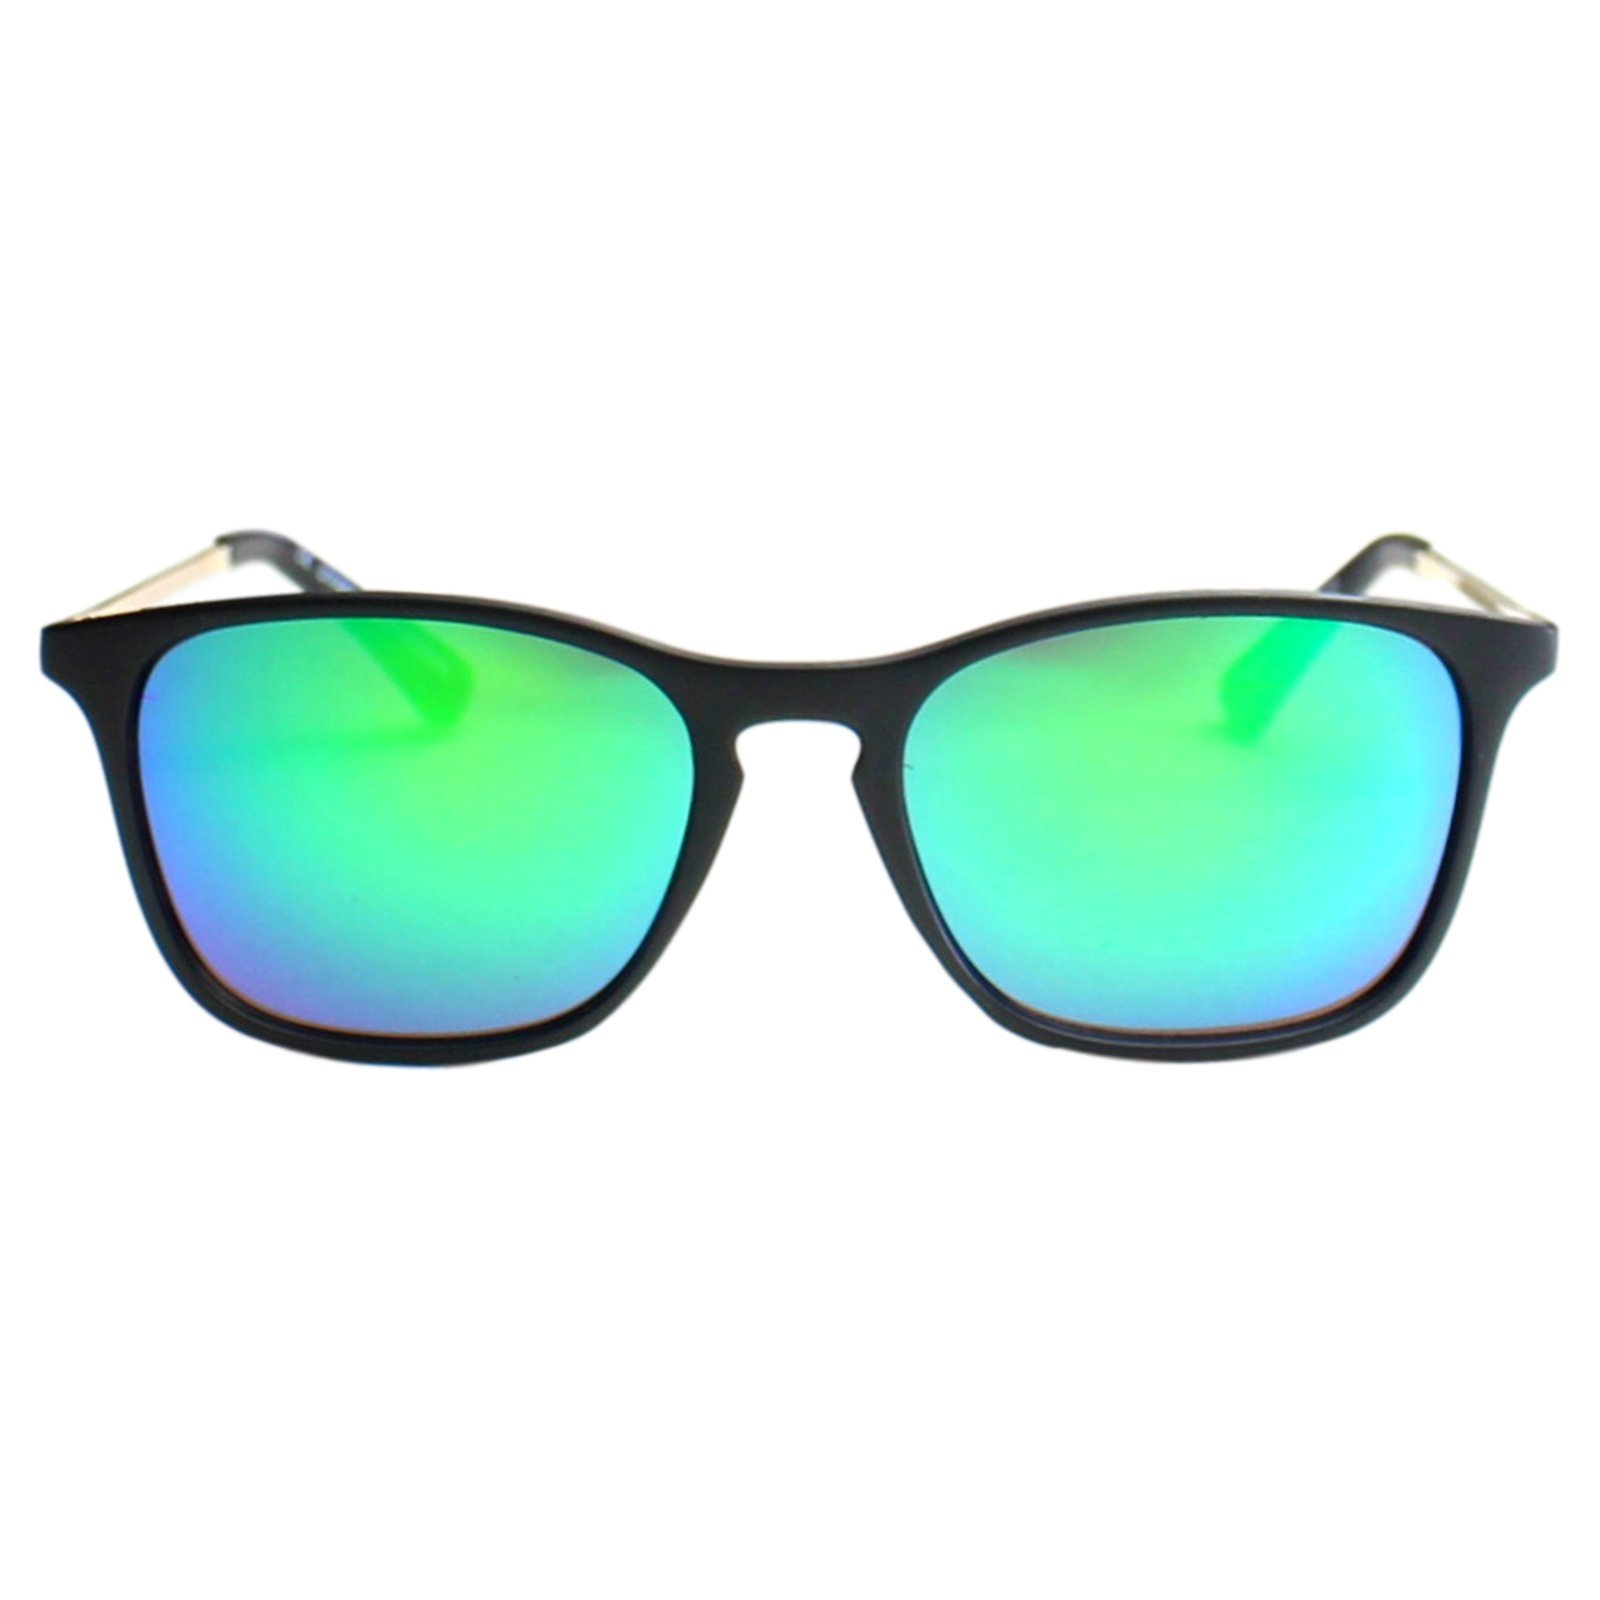 Óculos De Sol Díspar Infantil ID2037 Verde - Compre Agora